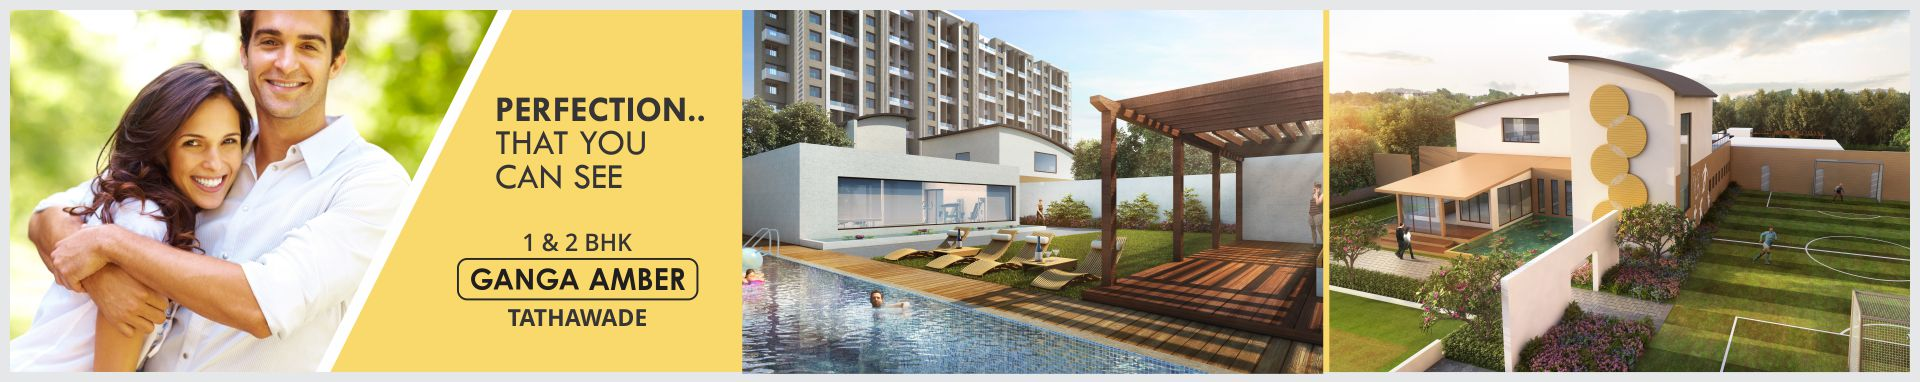 Ganga Amber - 1 & 2bhk-property-ad.jpeg